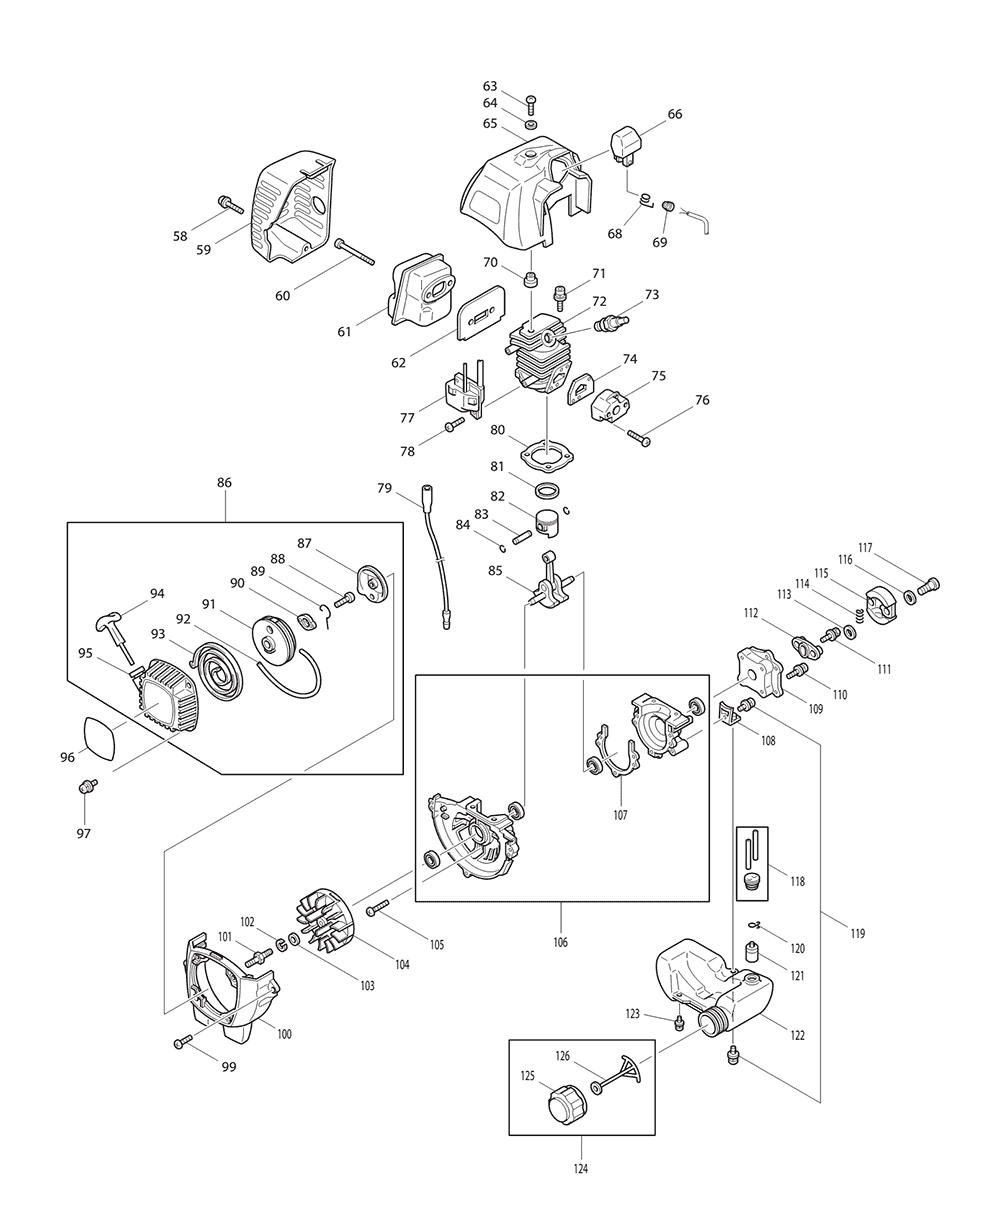 HTR5600-T1-Makita-PB-1Break Down